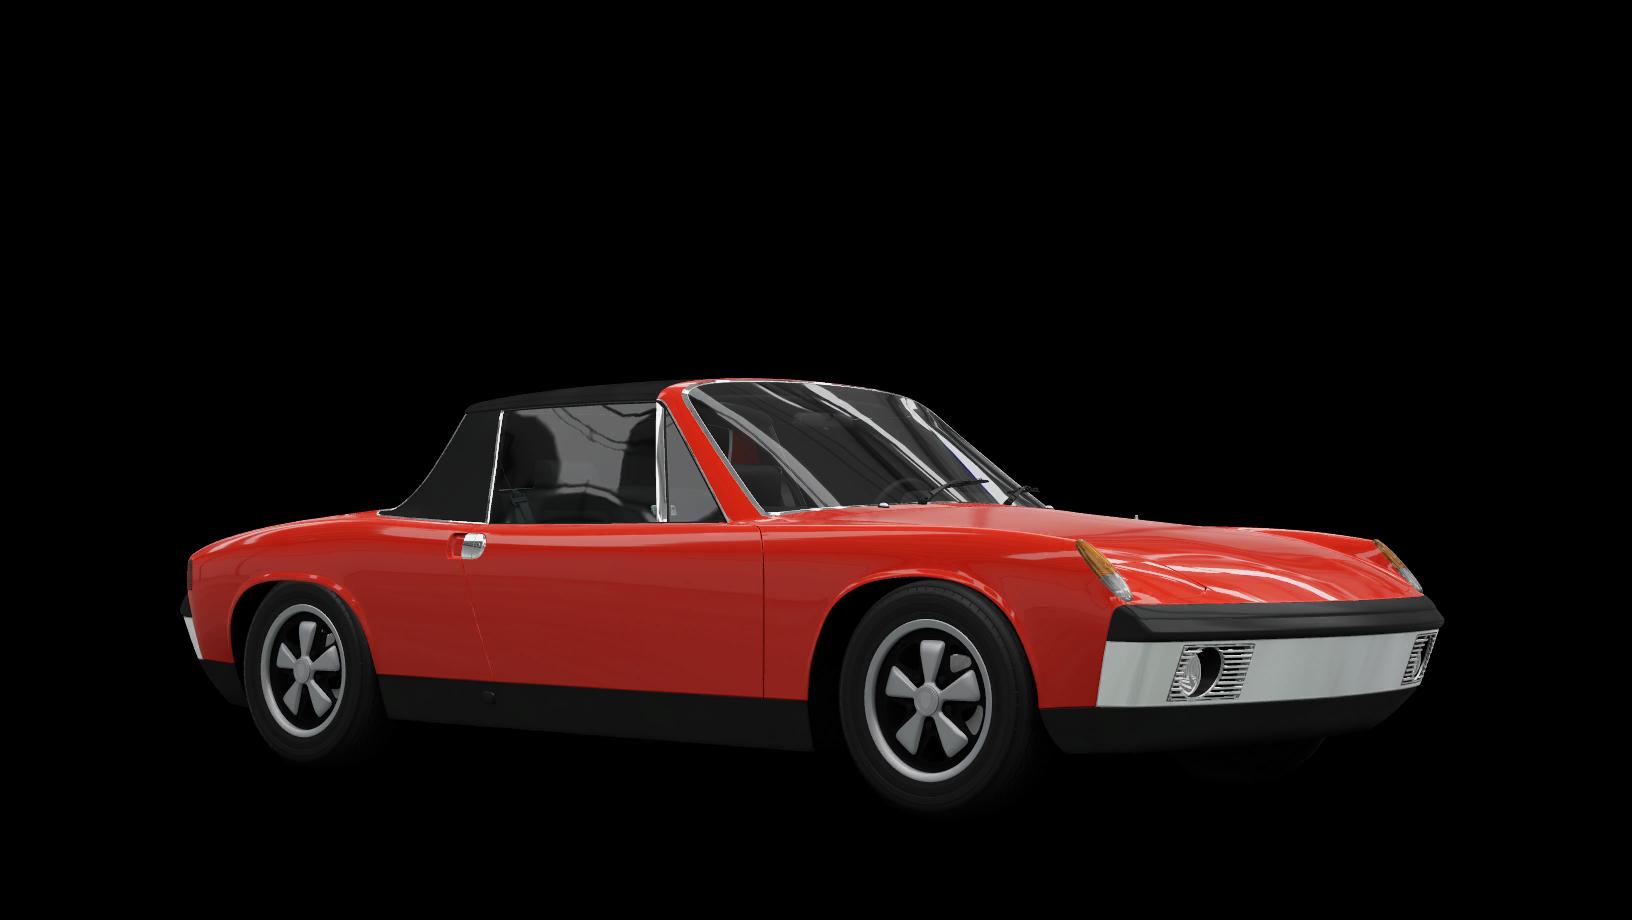 Porsche 914 6 Forza Wiki Fandom